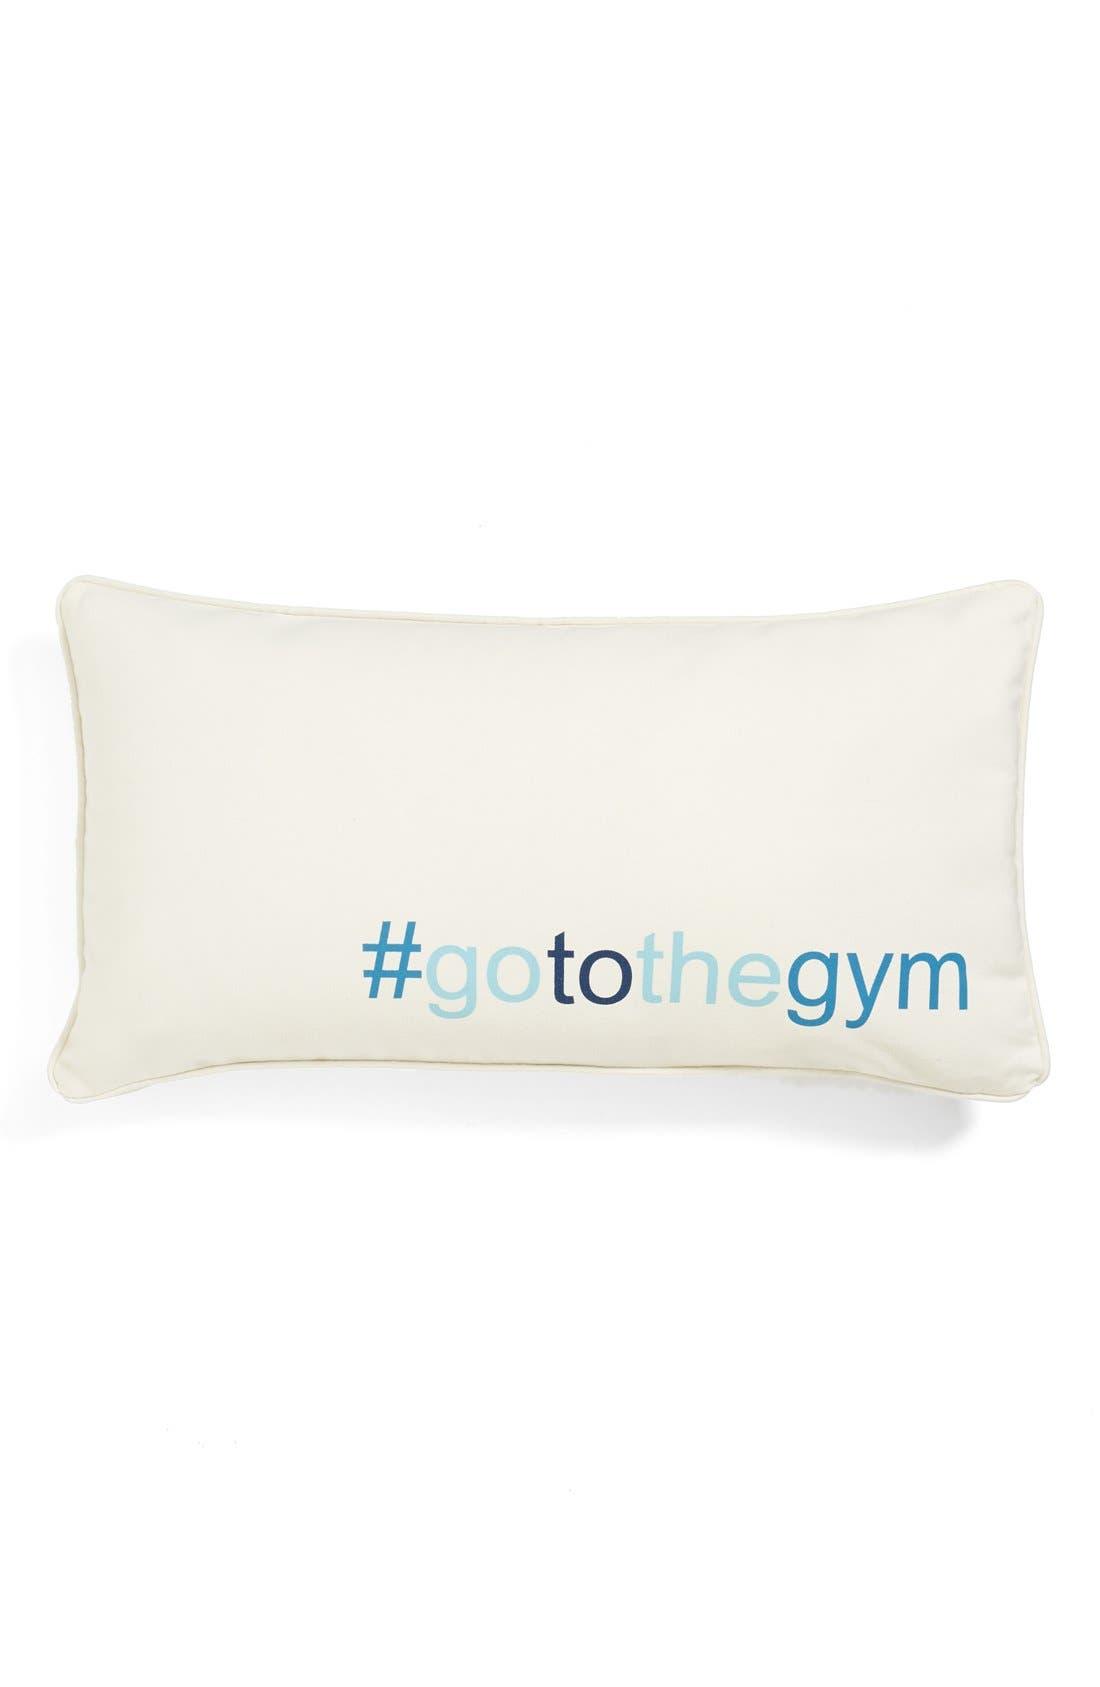 Main Image - Levtex '#gotothegym' Pillow